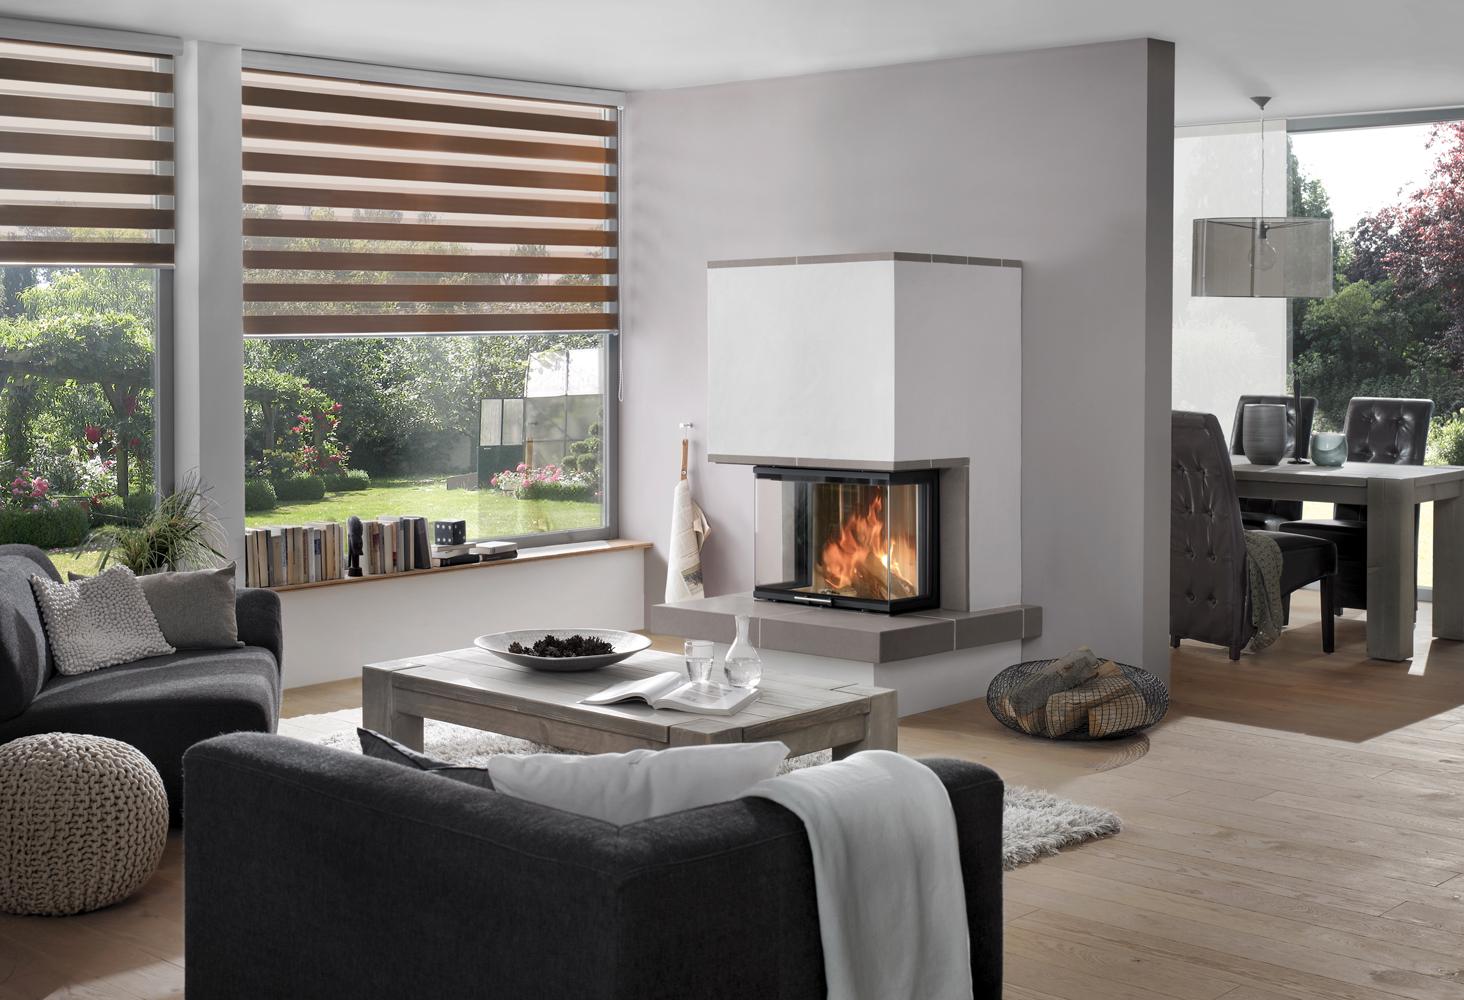 kachelofen bringt zukunftssichere w rme. Black Bedroom Furniture Sets. Home Design Ideas